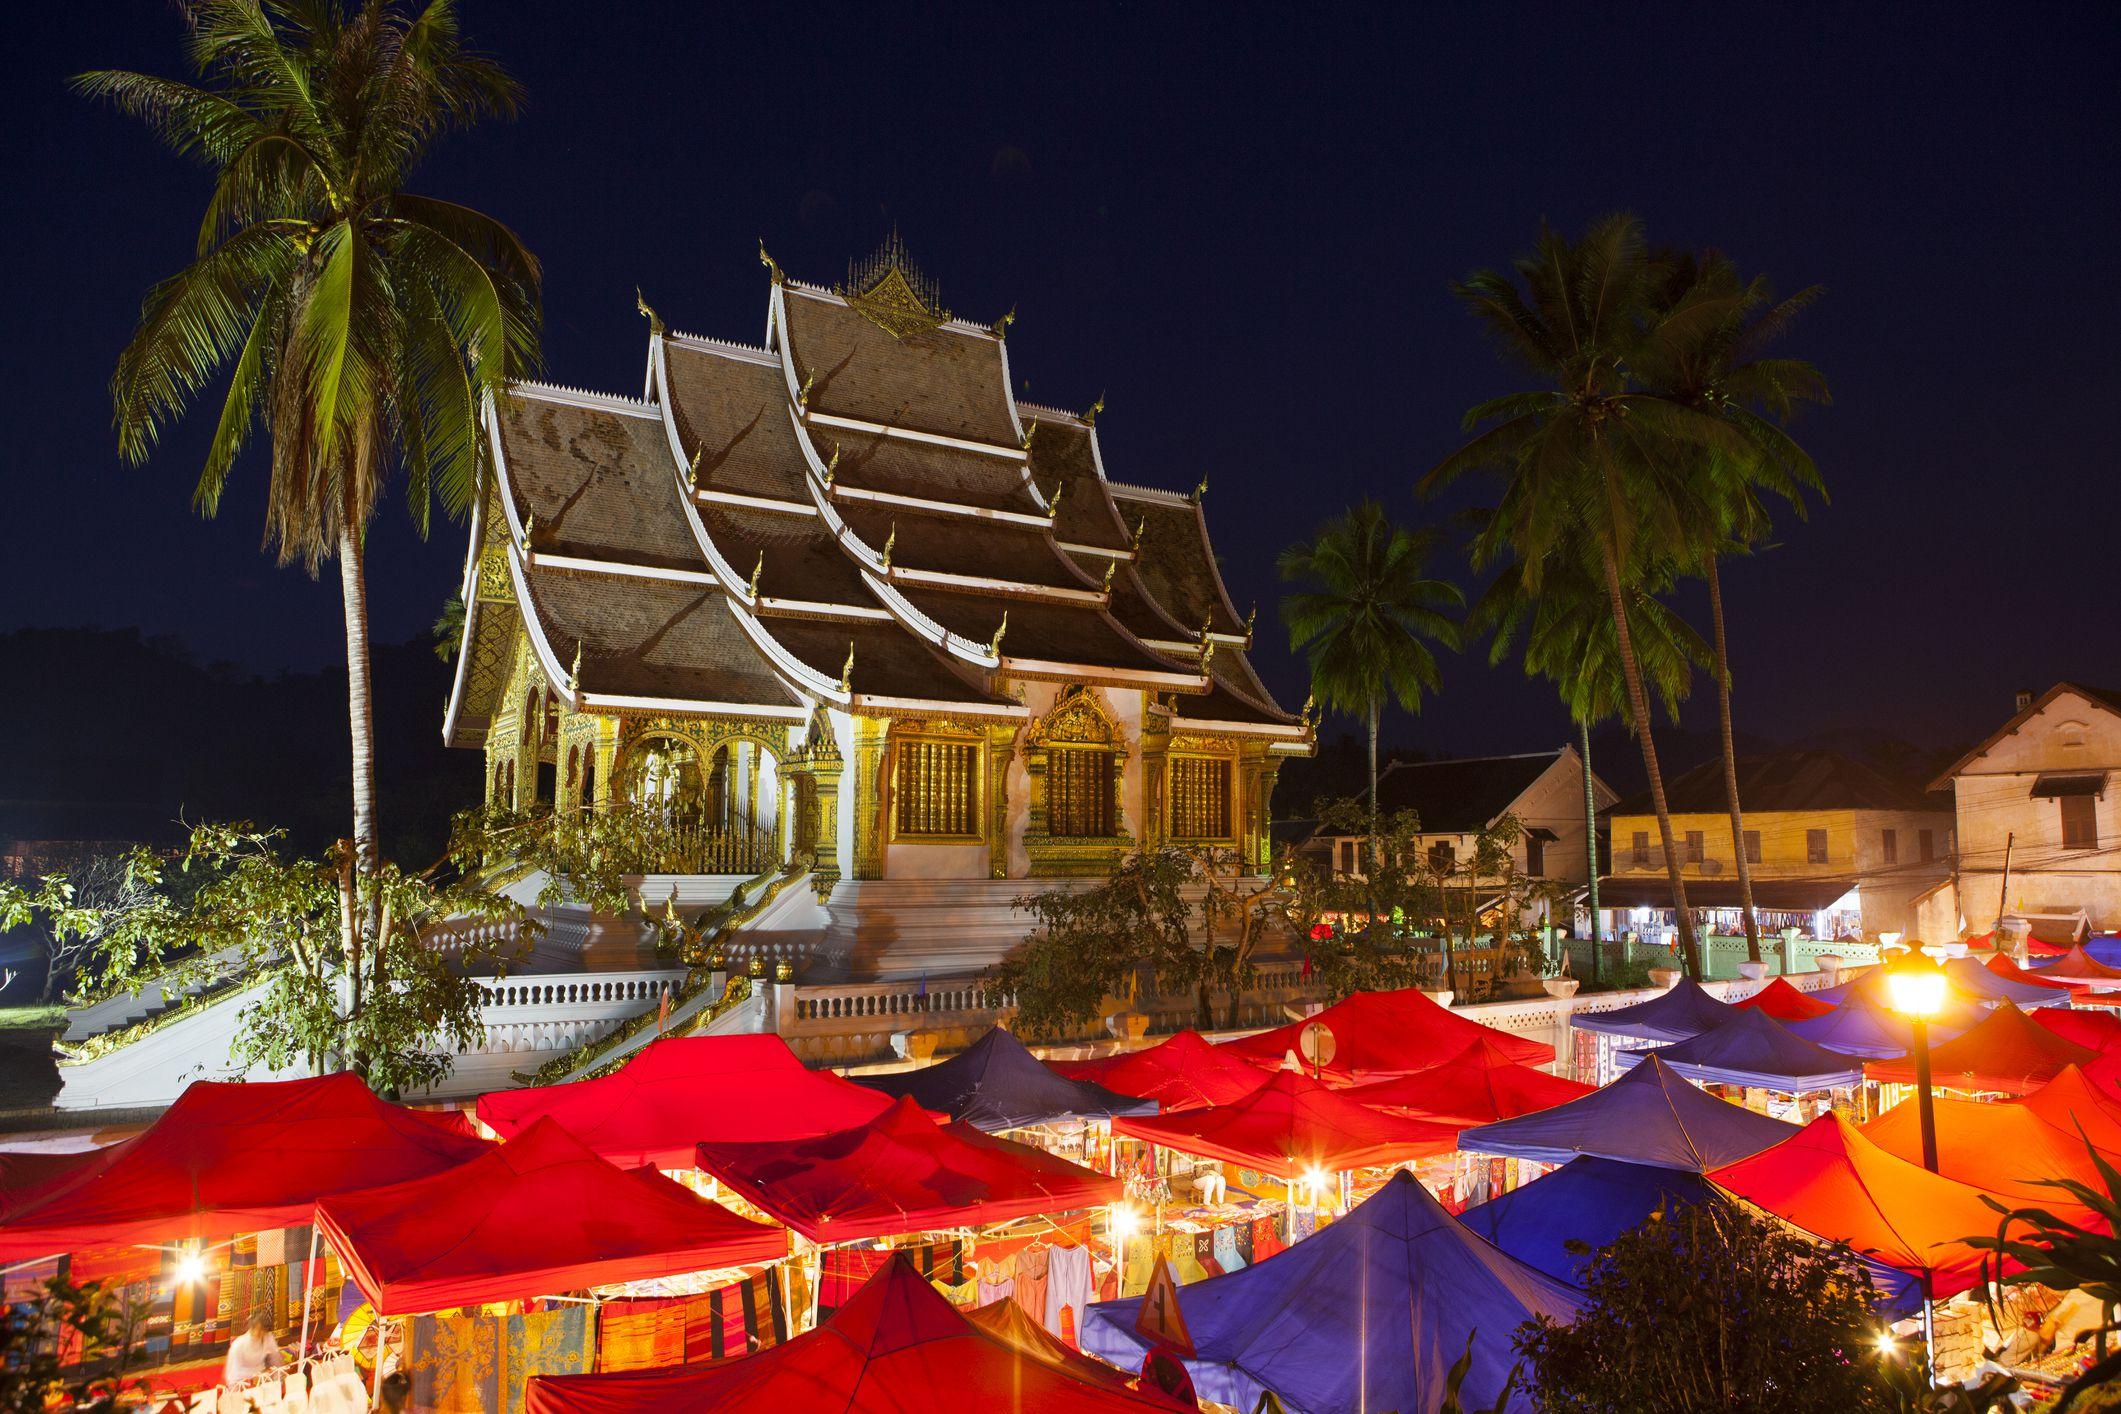 How to Shop Like a Pro at the Luang Prabang Night Market